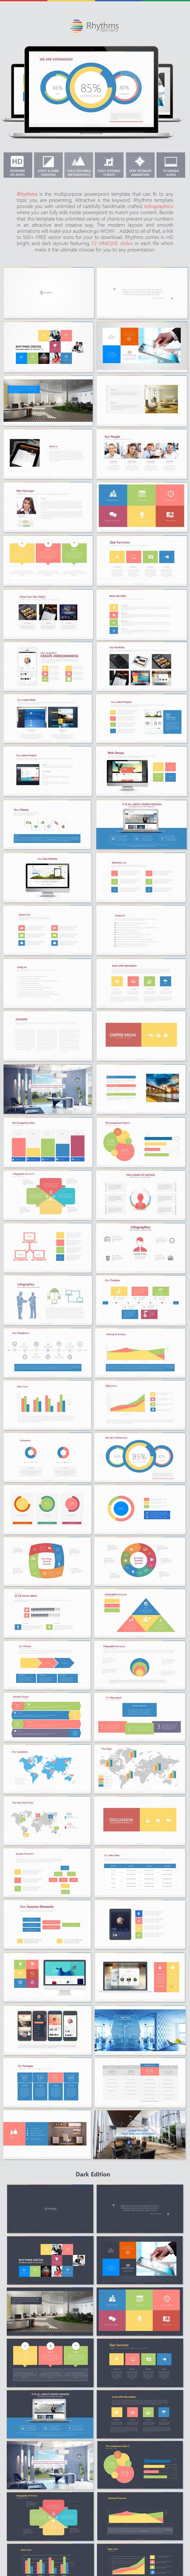 Rhythms Ultimate Presentation Template - PowerPoint Templates Presentation Templates